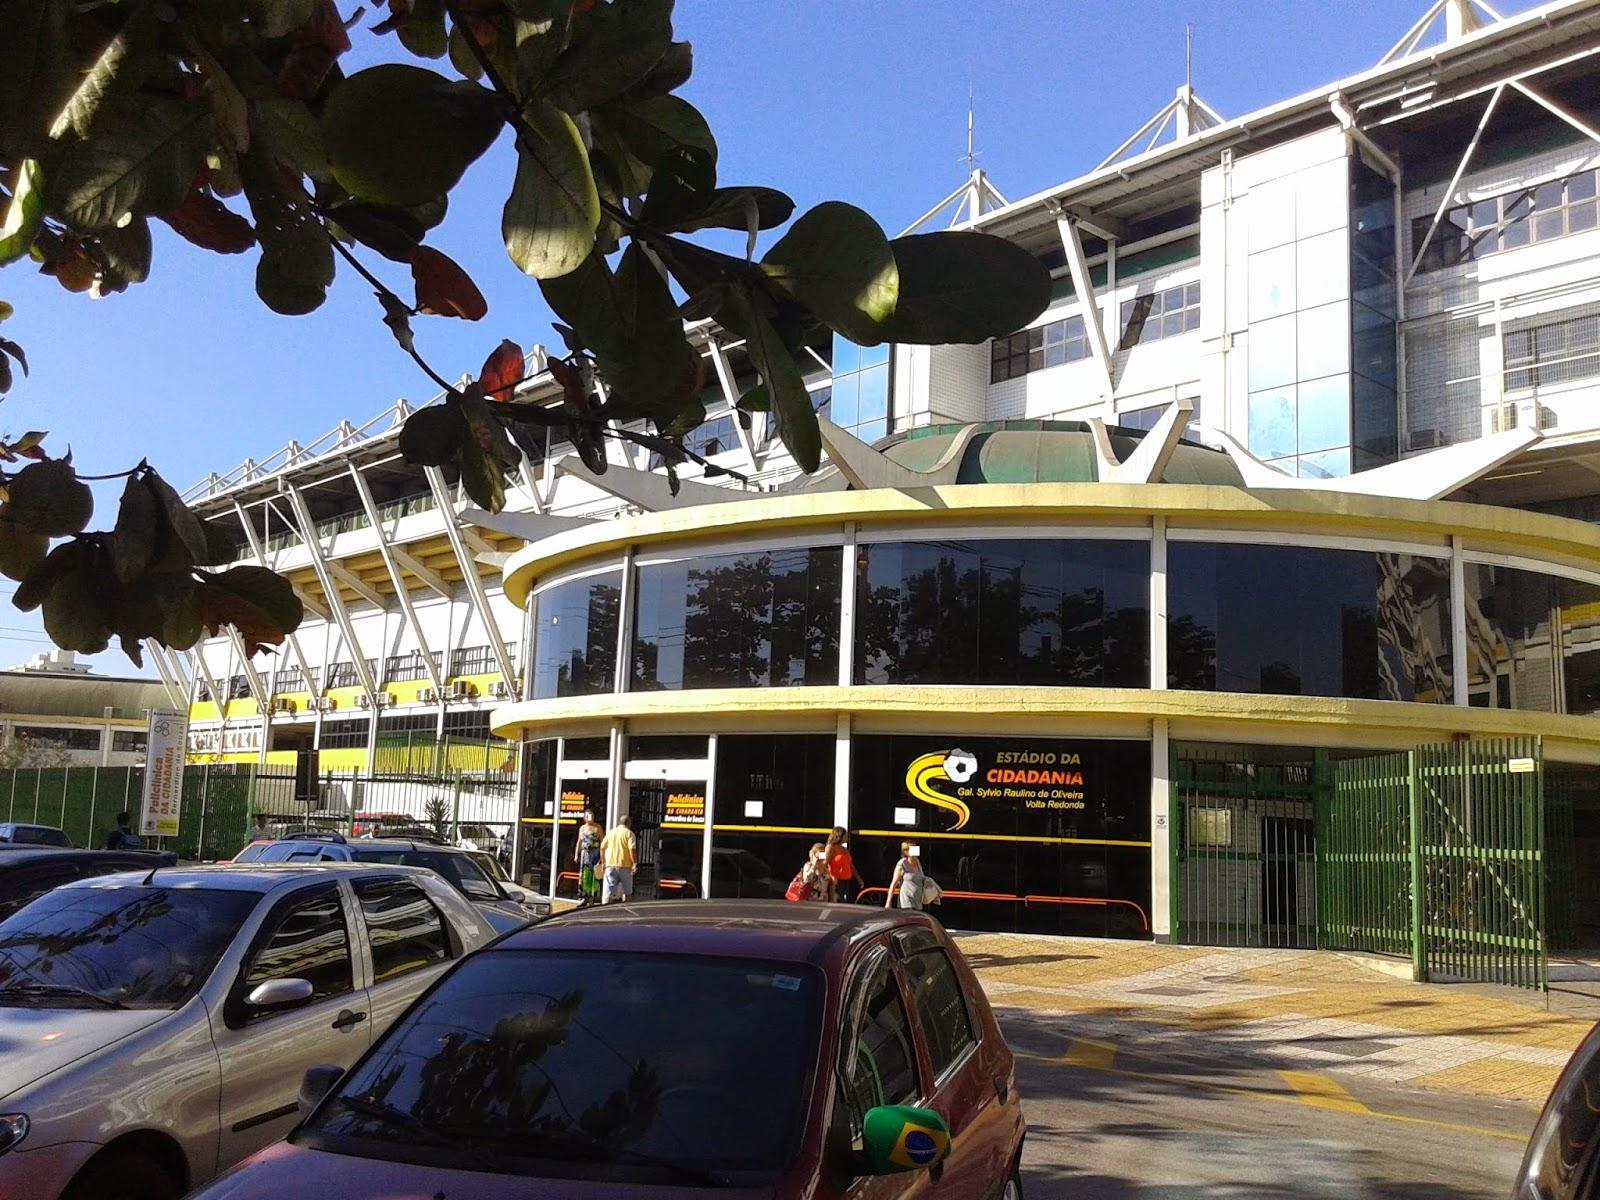 Estádio da Cidadania